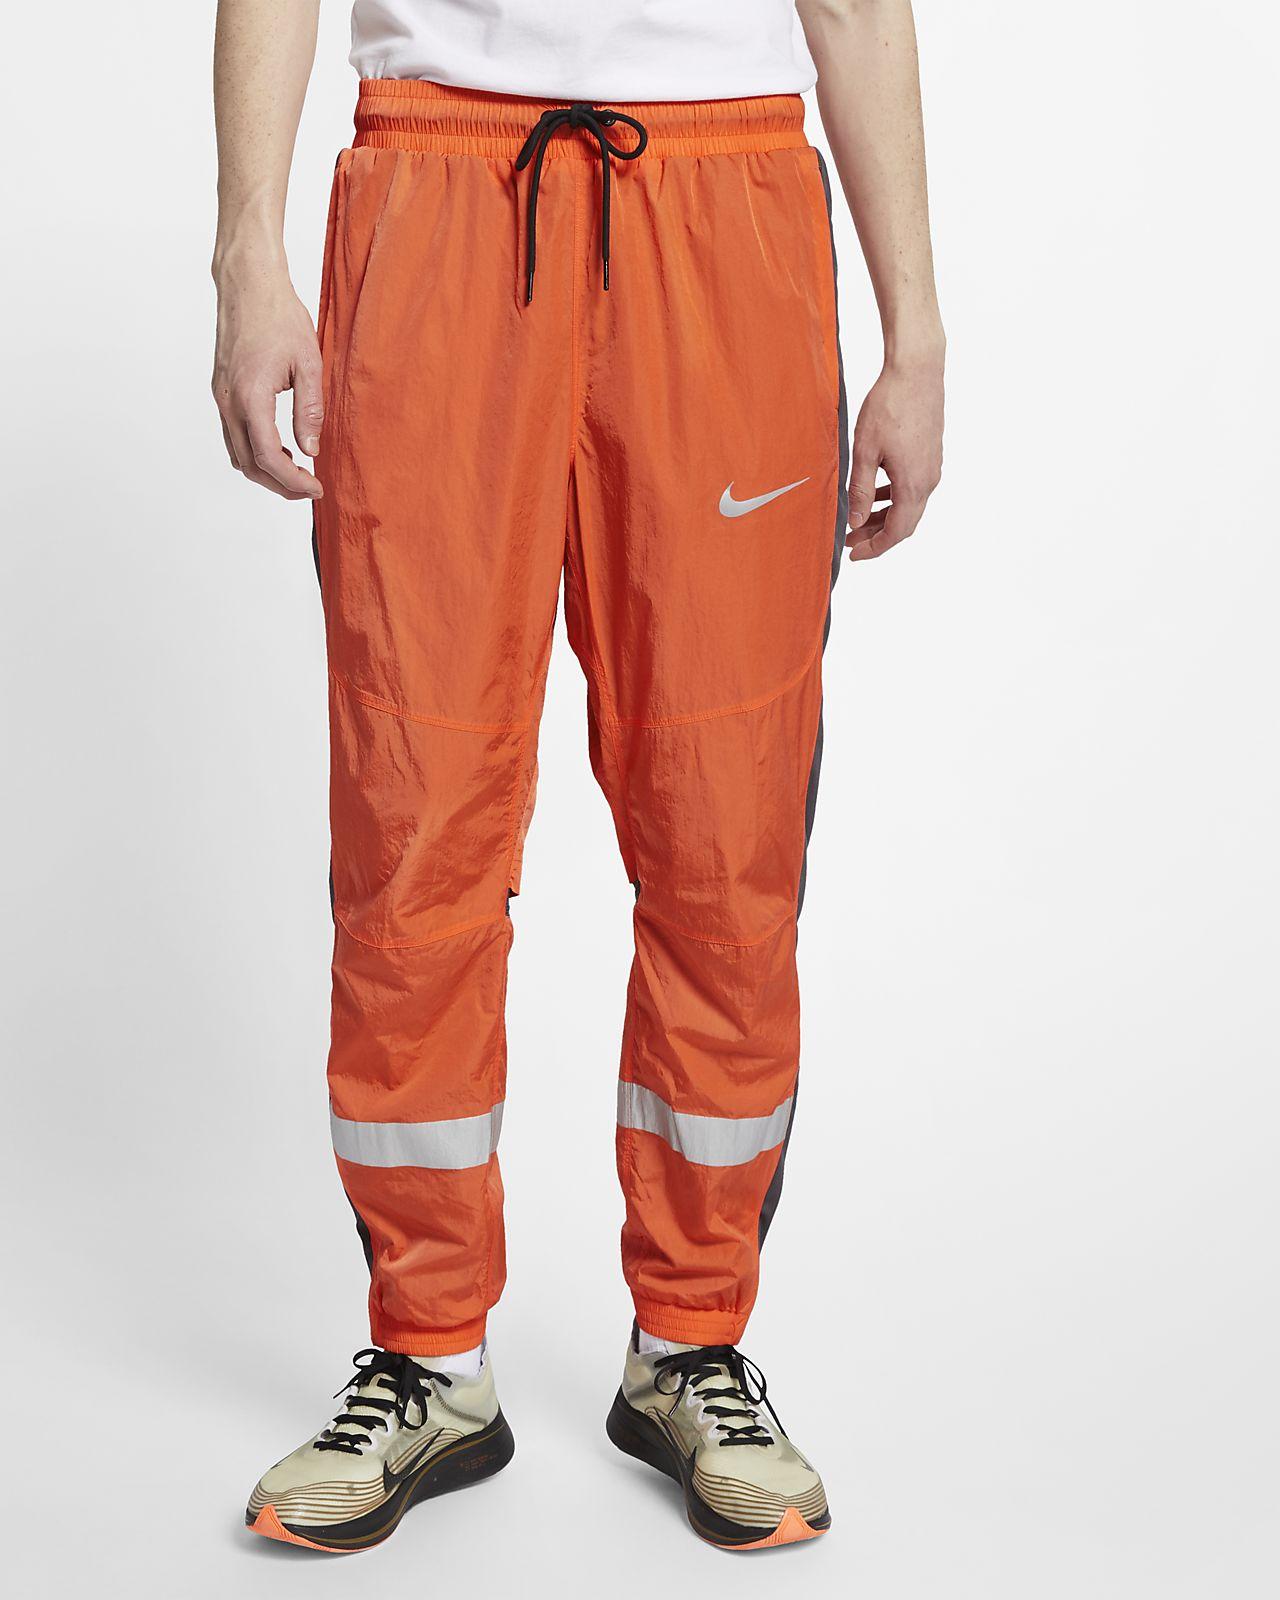 82f6135aa2be57 Nike Men's Running Track Pants. Nike.com